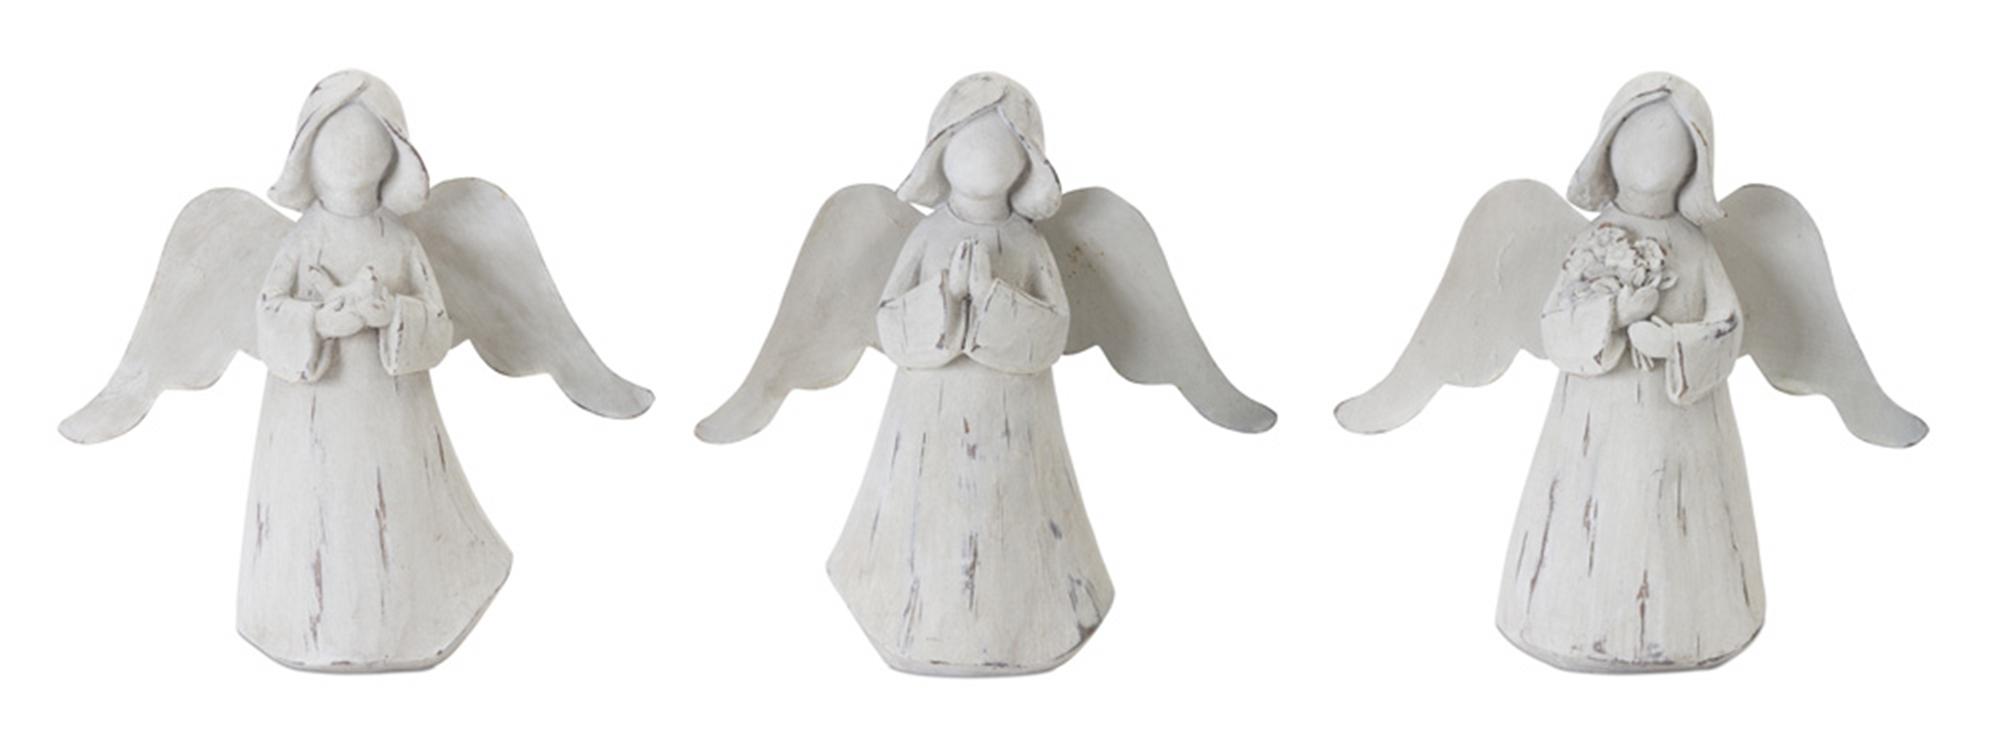 "Angel (Set of 6) 6.25""H Resin"